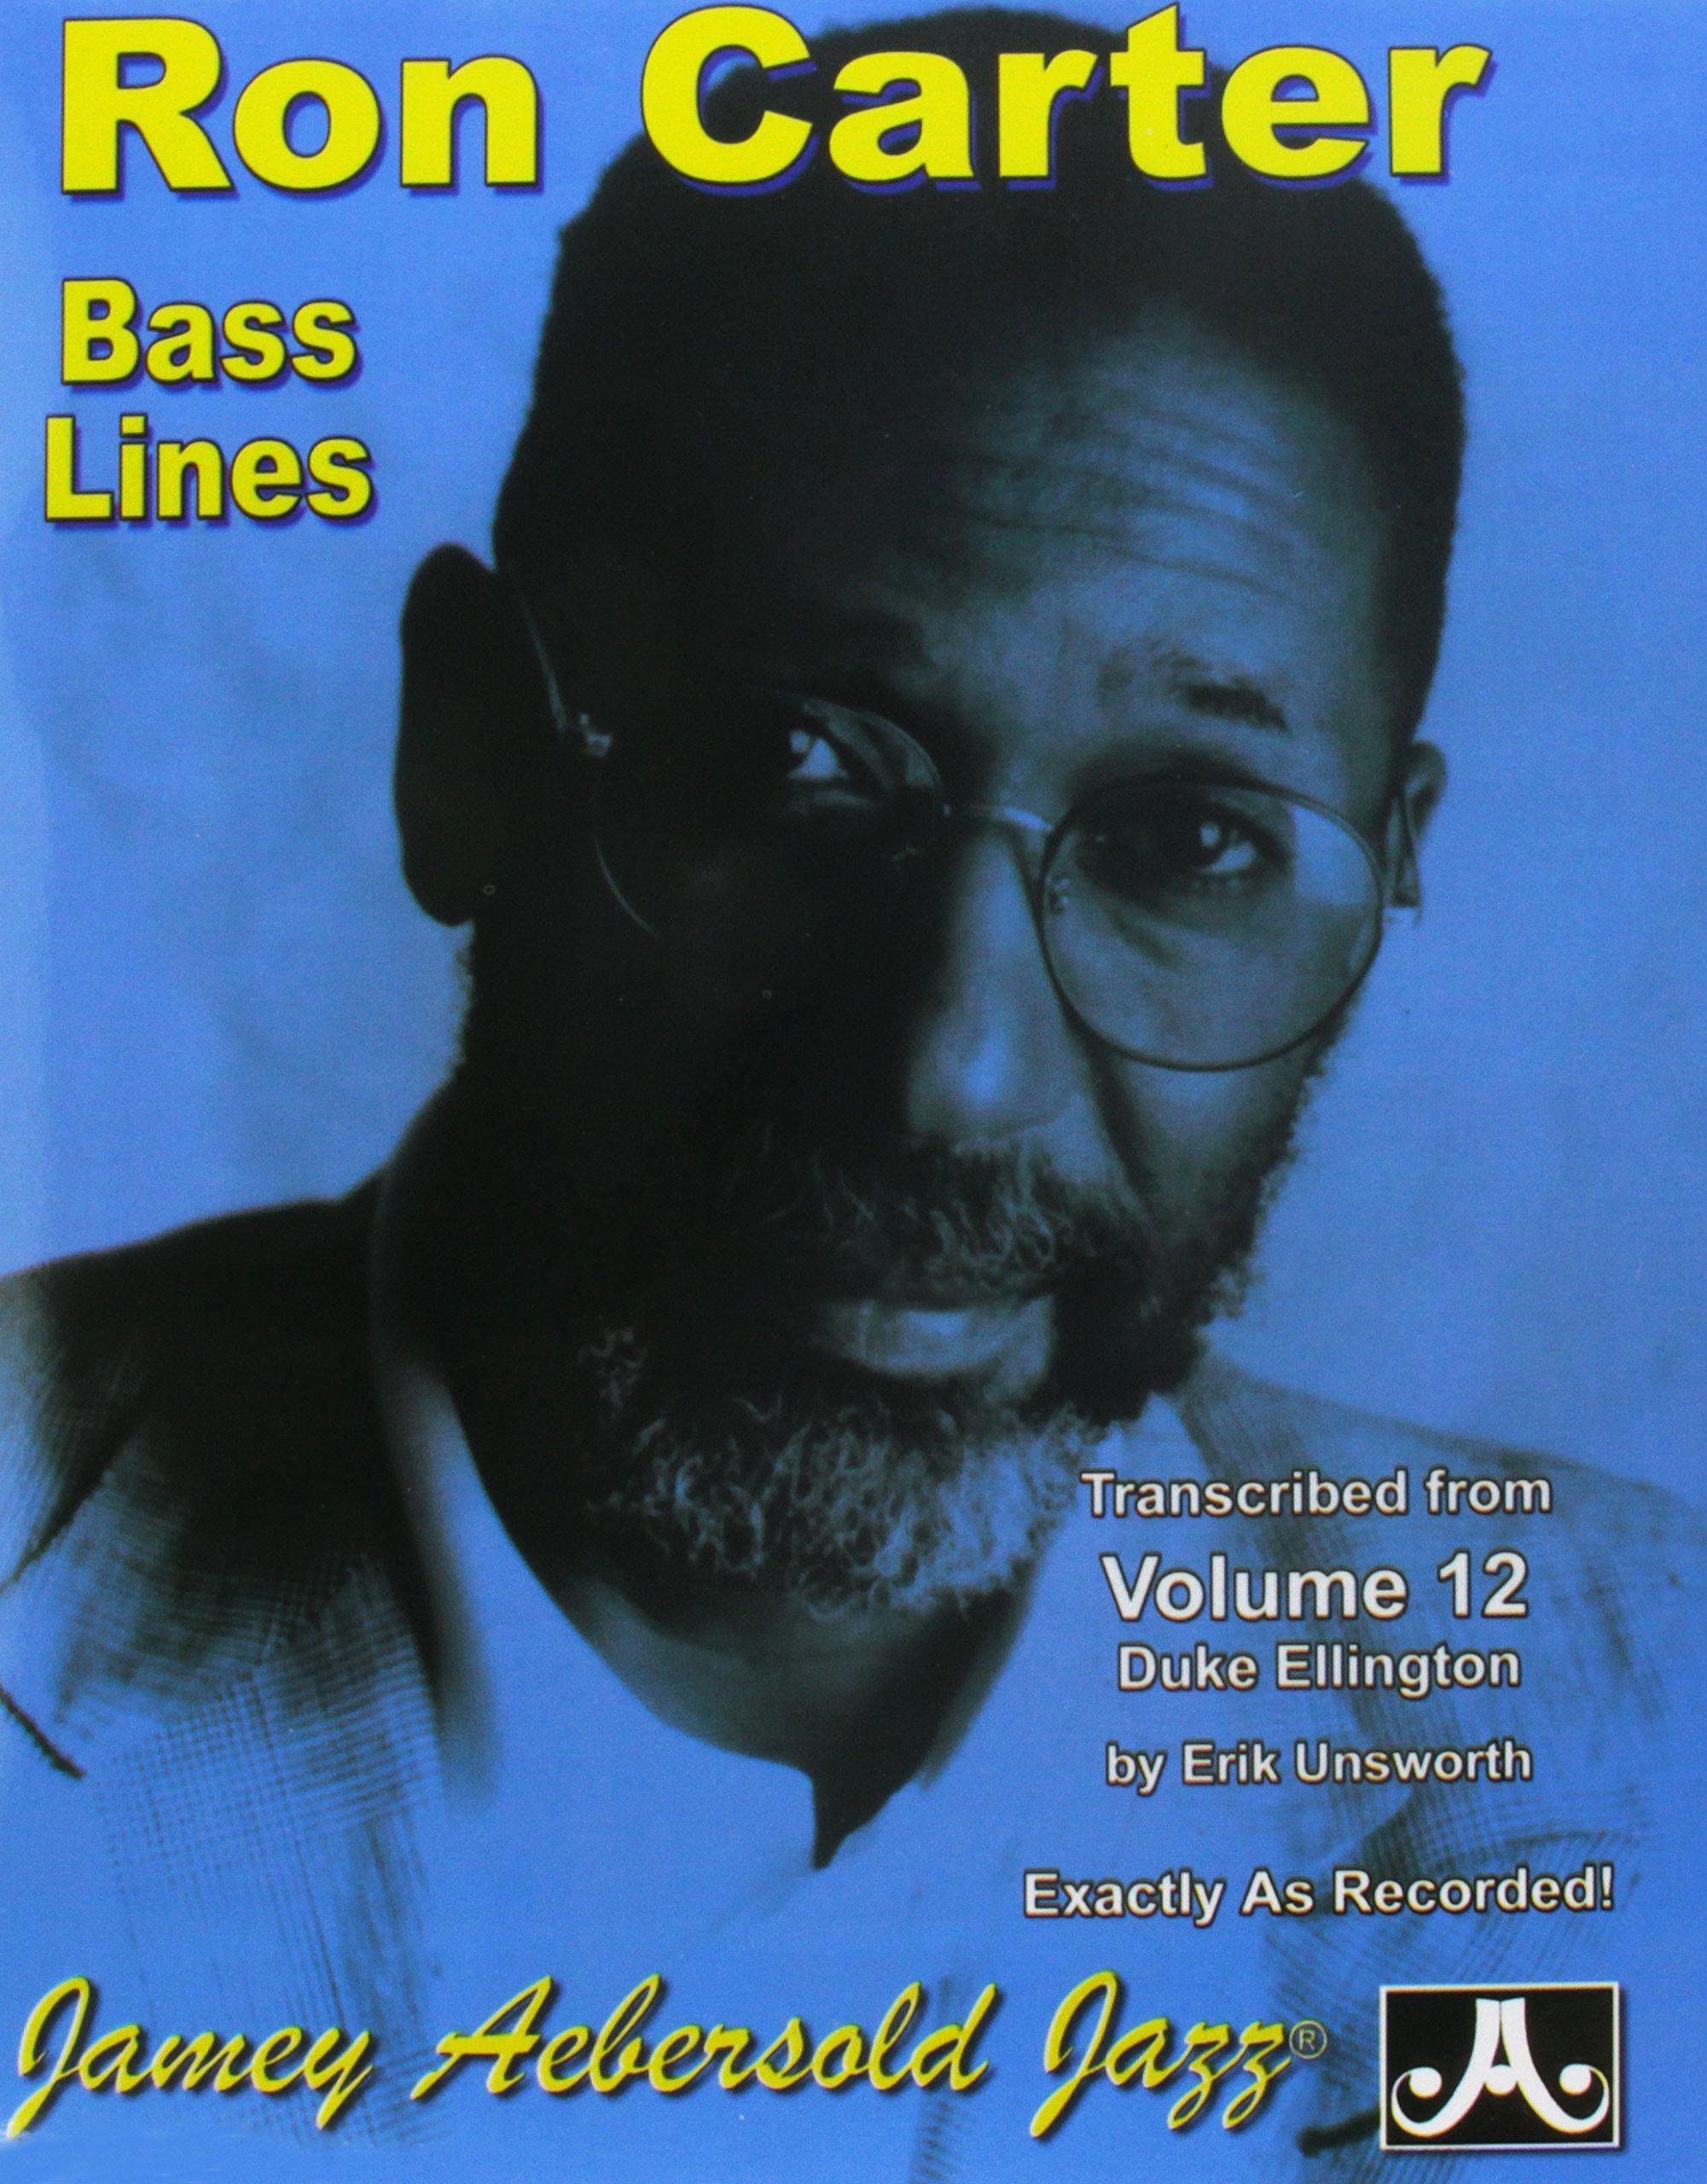 Bass Lines Aebersold 12 Duke Ellington By Ron Carter: Amazon ...